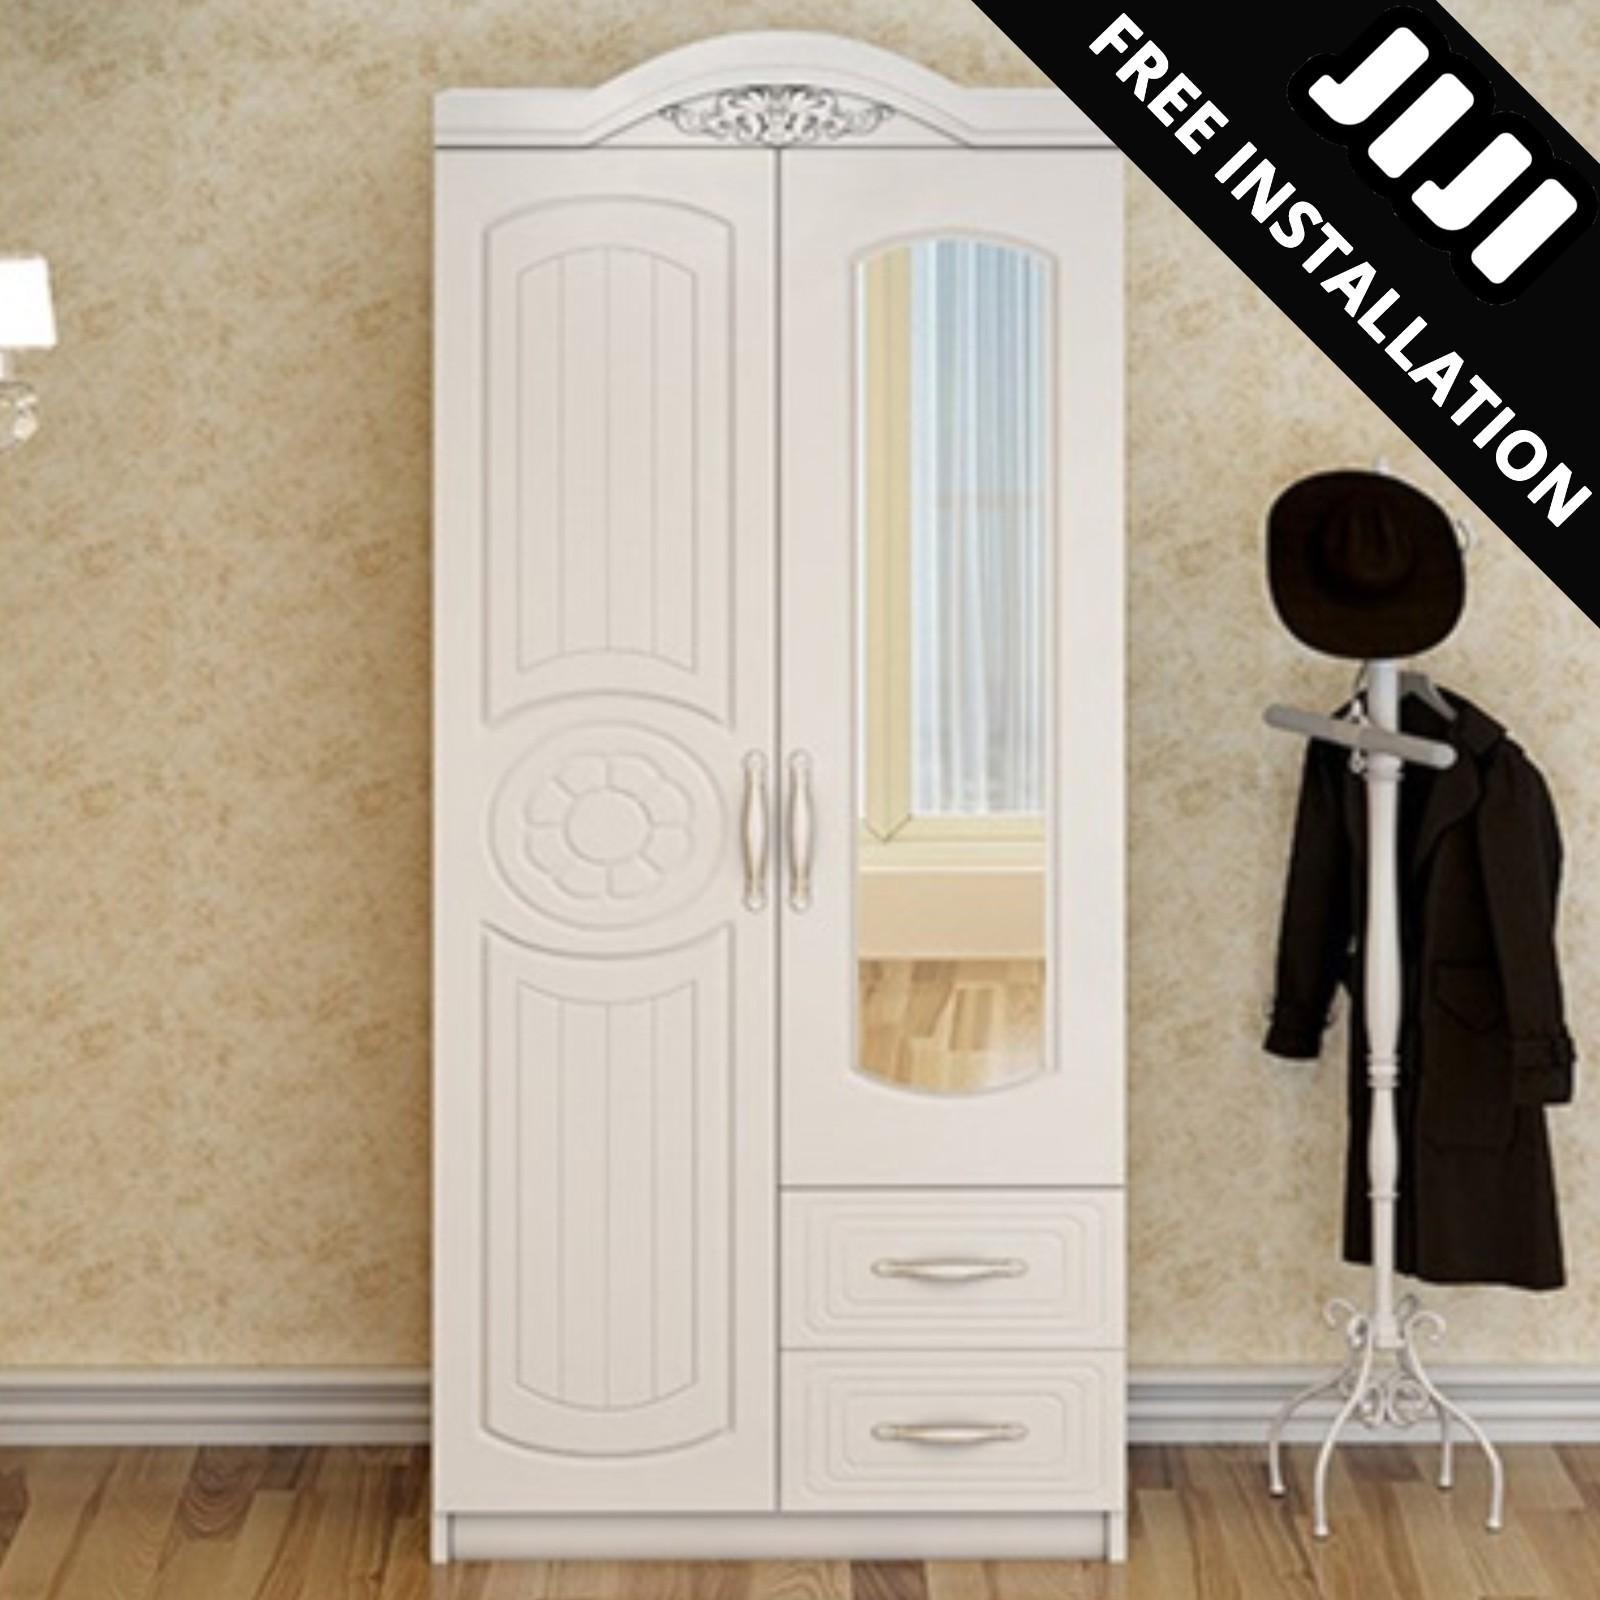 JIJI Premium European White Wardrobe With Mirror (Free Installation) - Bedroom Furniture / Wardrobes / 2019 (SG)